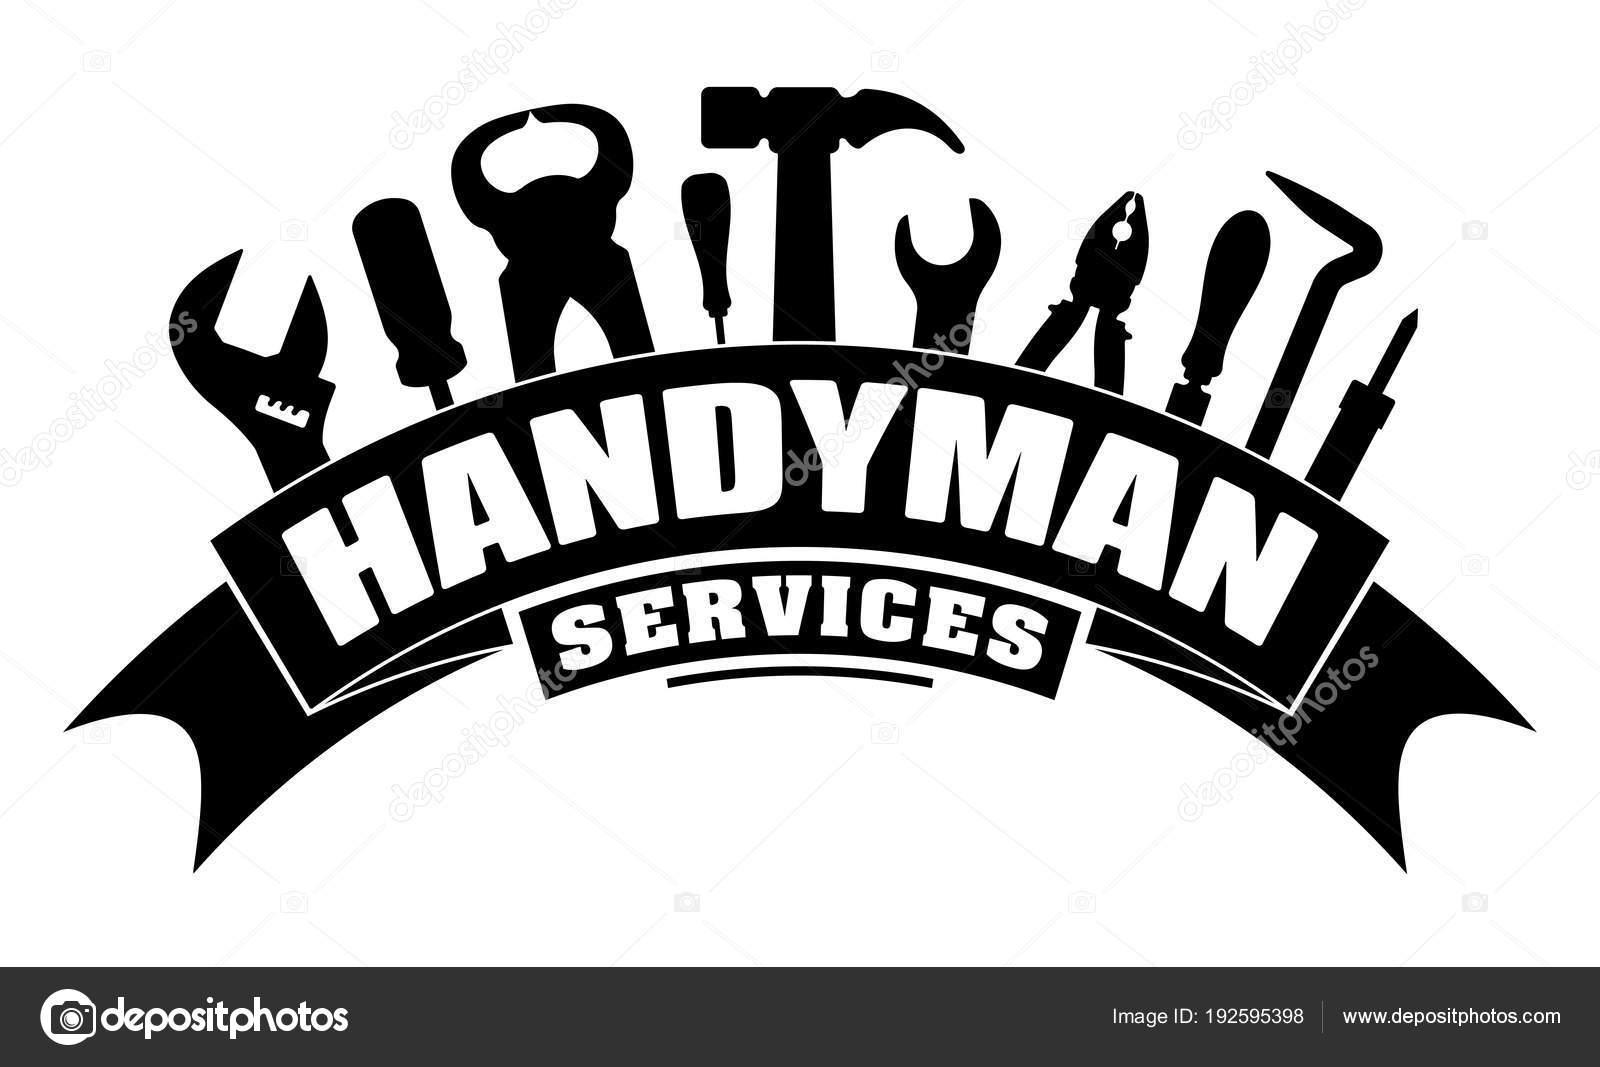 Servicios Handyman Diseno Para Logotipo Emblema Con